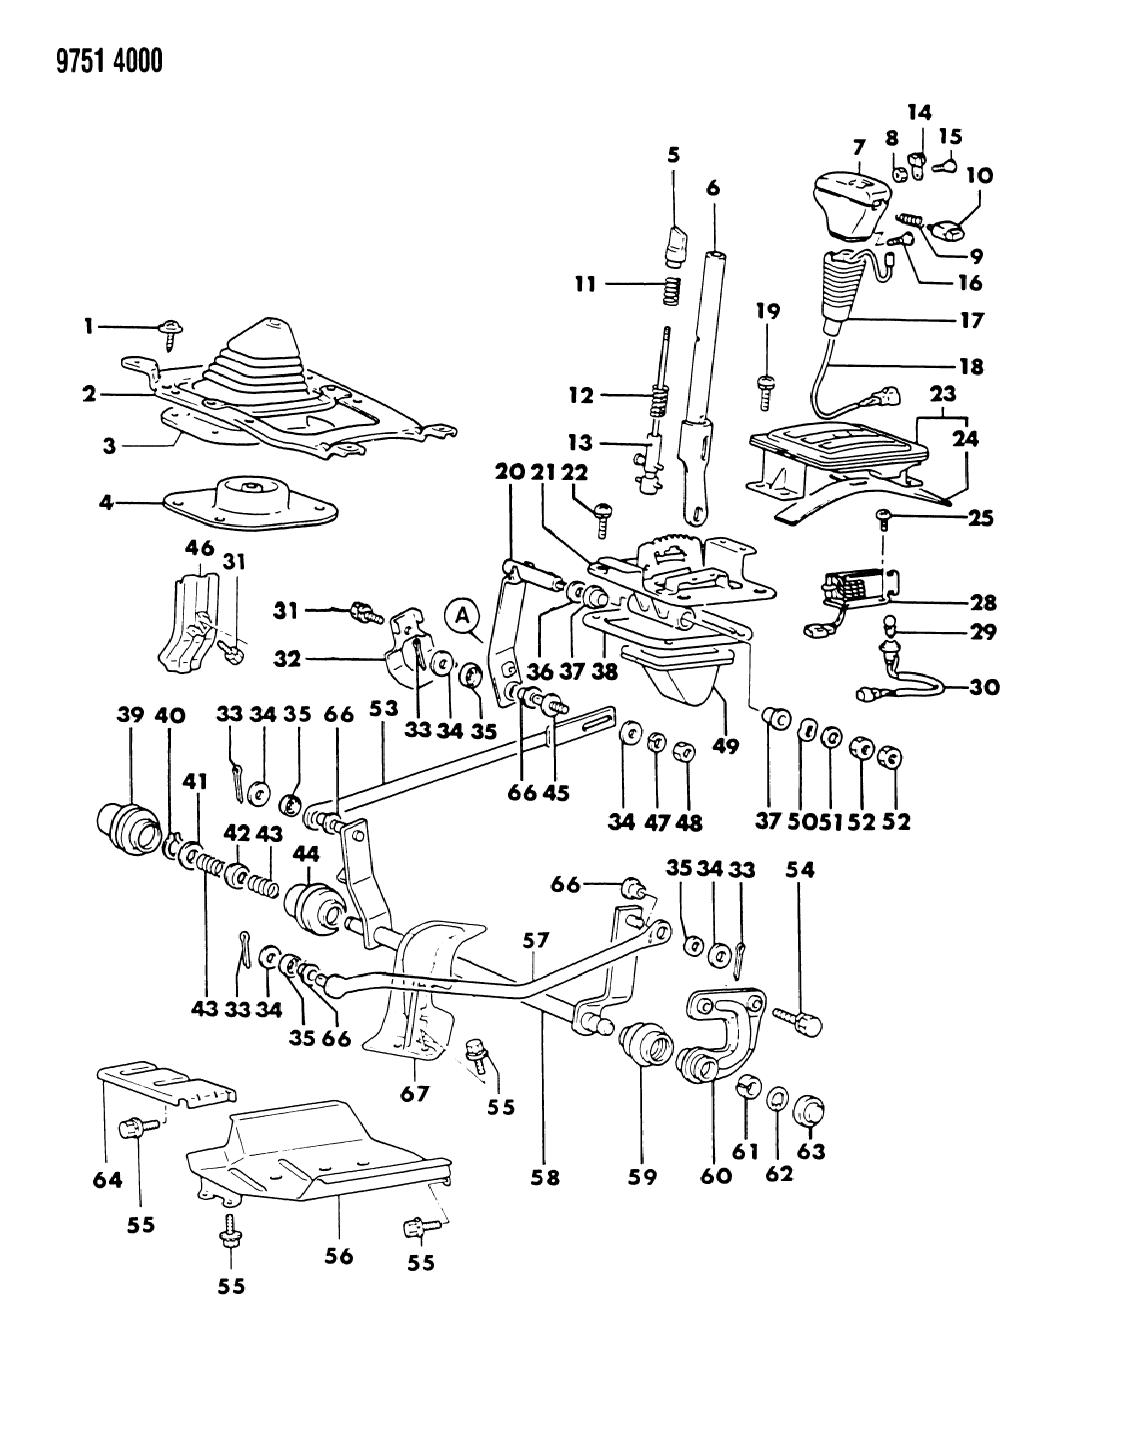 Mf243651 Genuine Mopar Bolt 1989 Dodge Wiring Diagram Raider Controls Gearshift